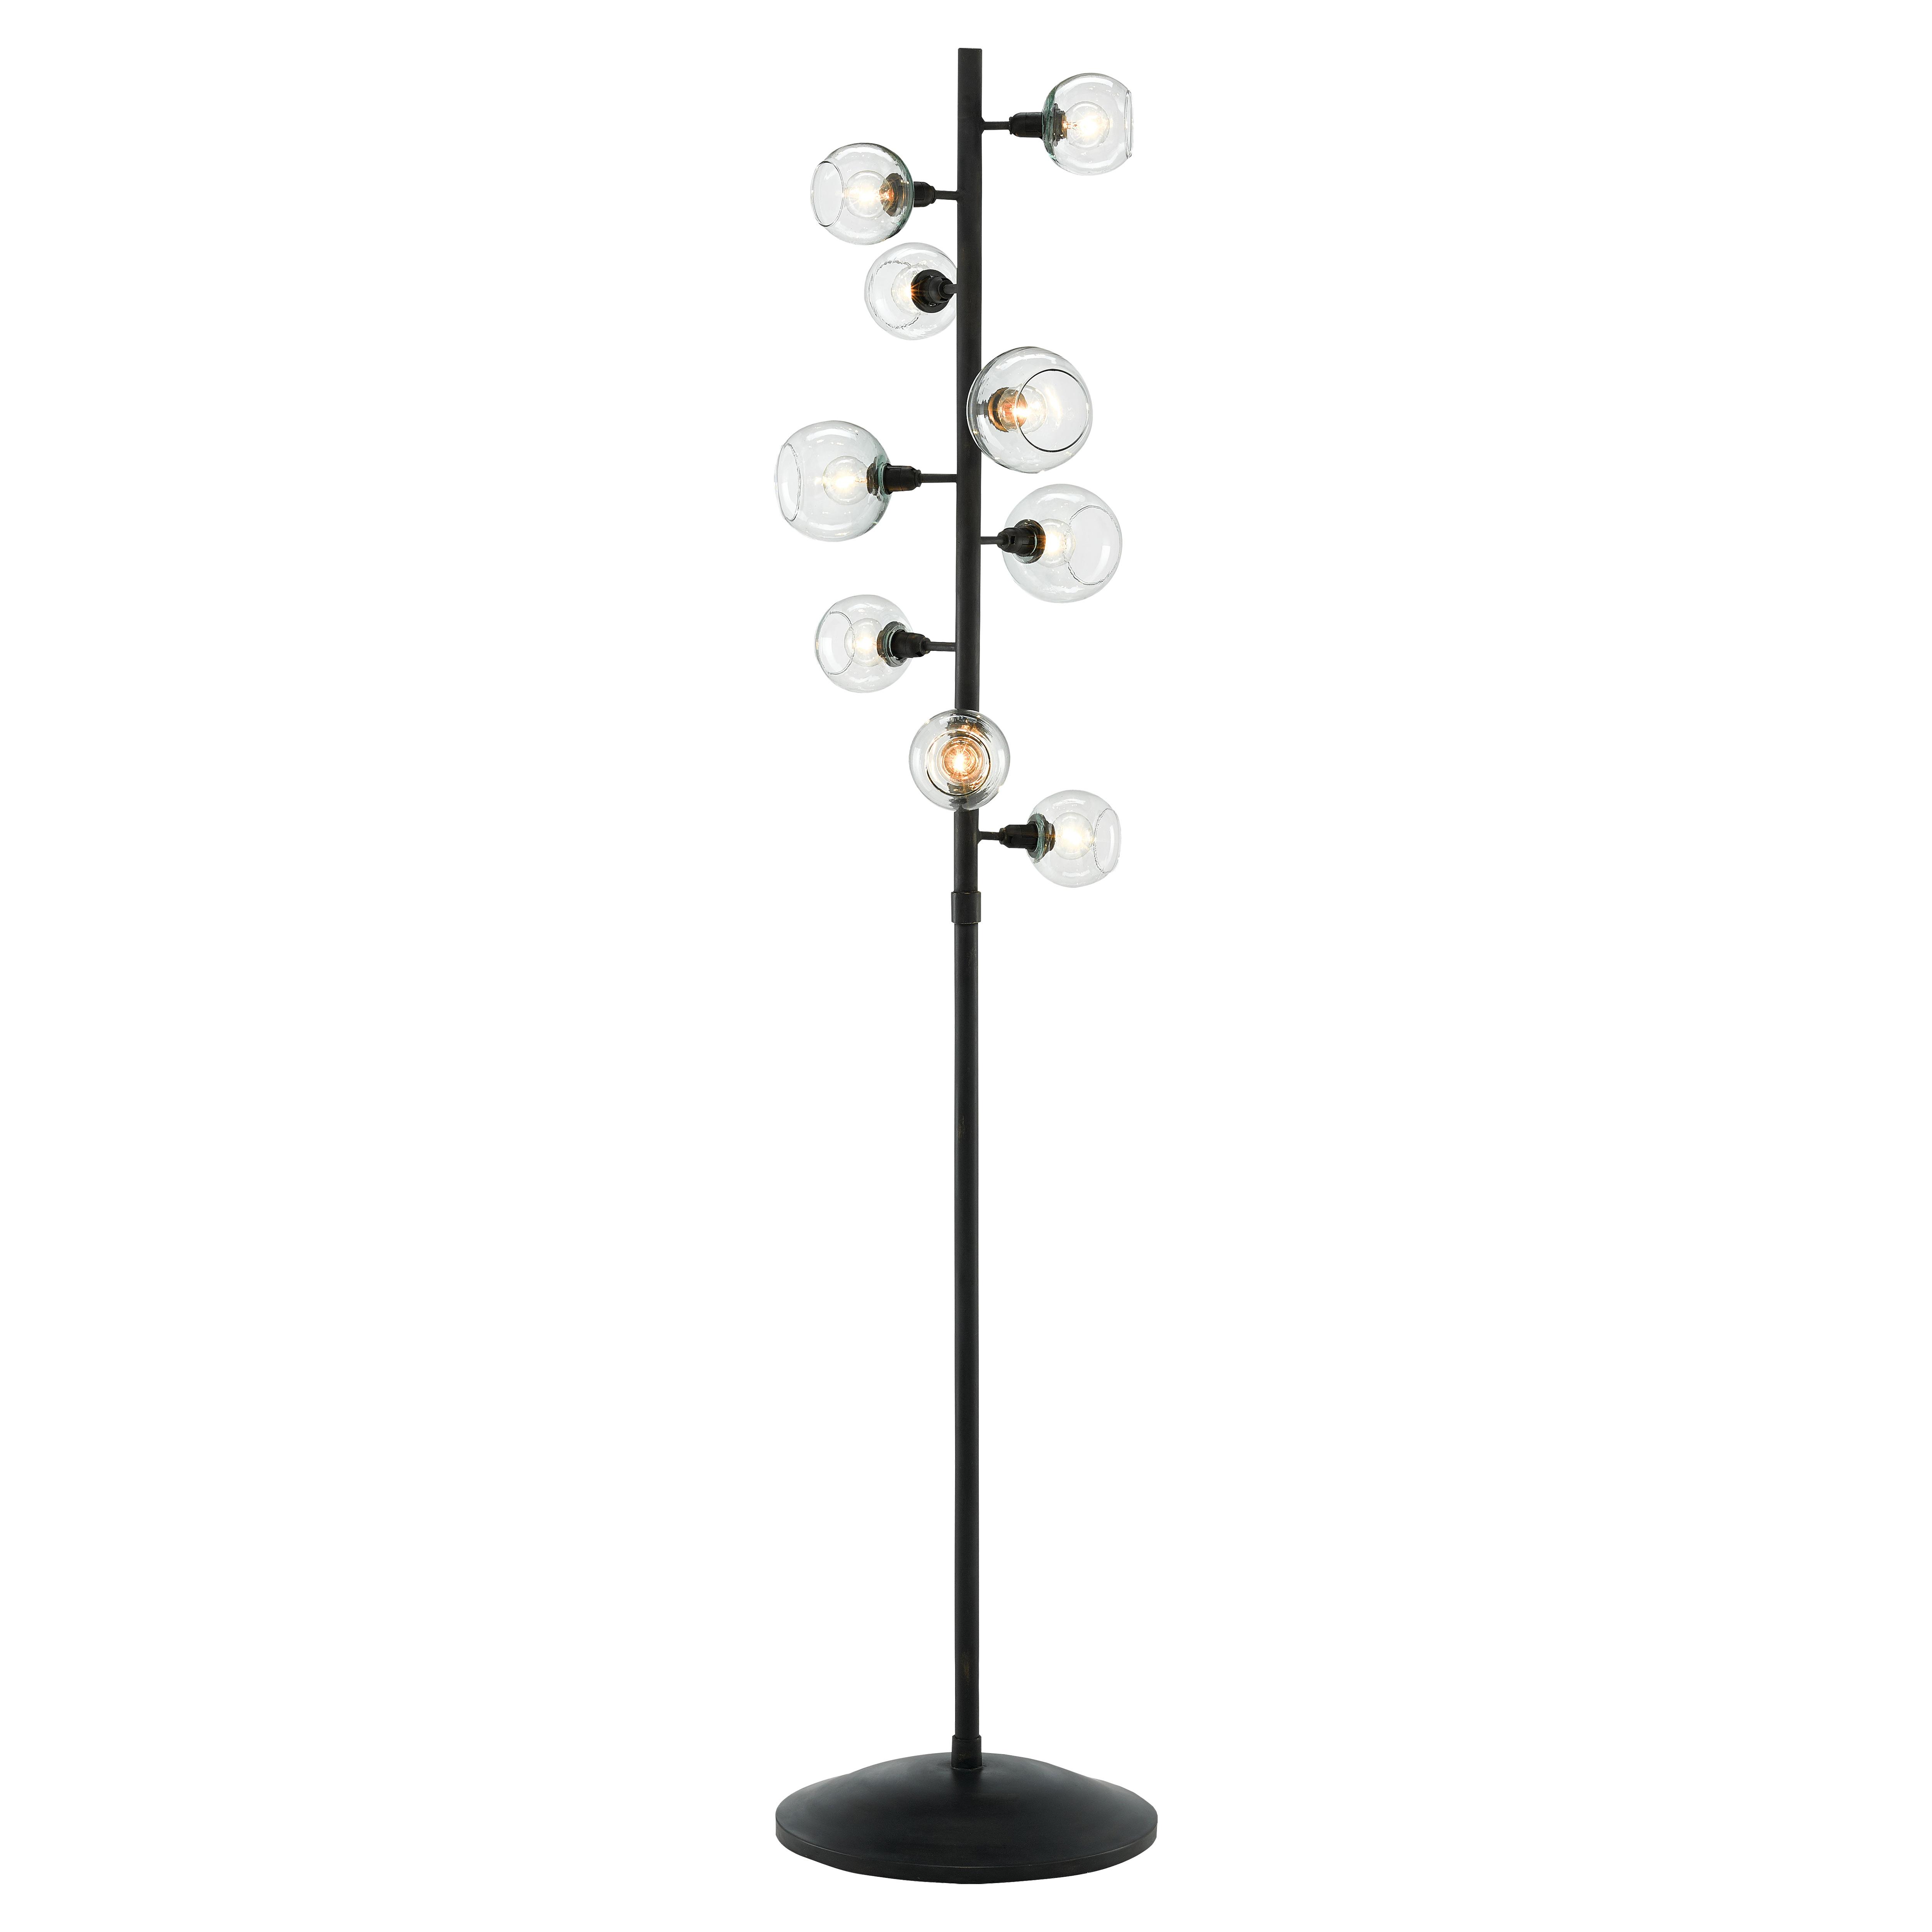 Jakob Modern Industrial Black Iron Glass Shade 9 Light Floor Lamp